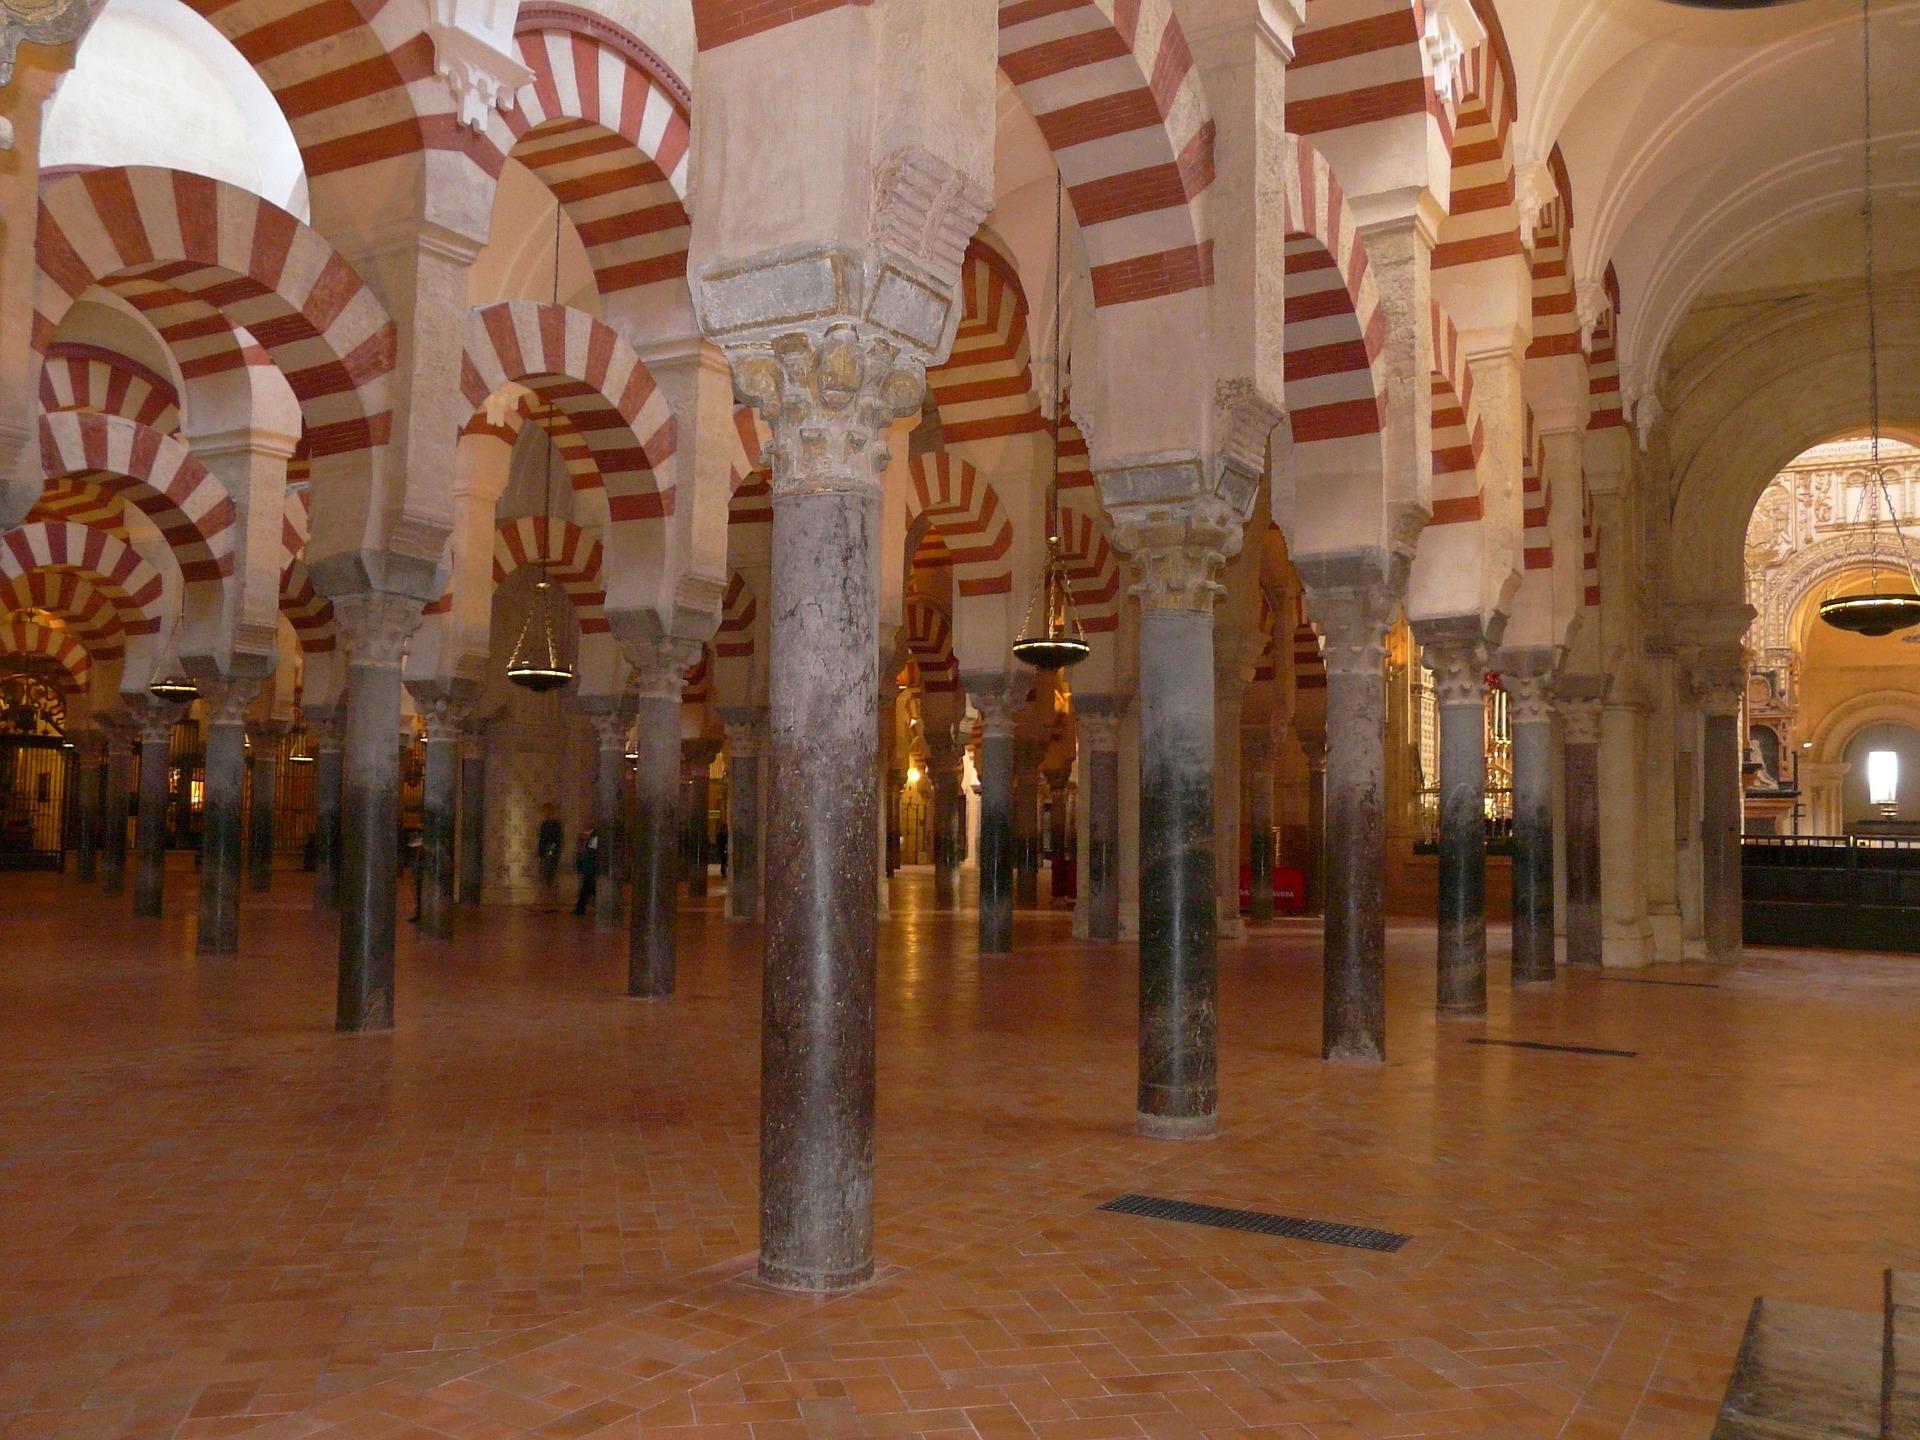 mosque-642862_1920